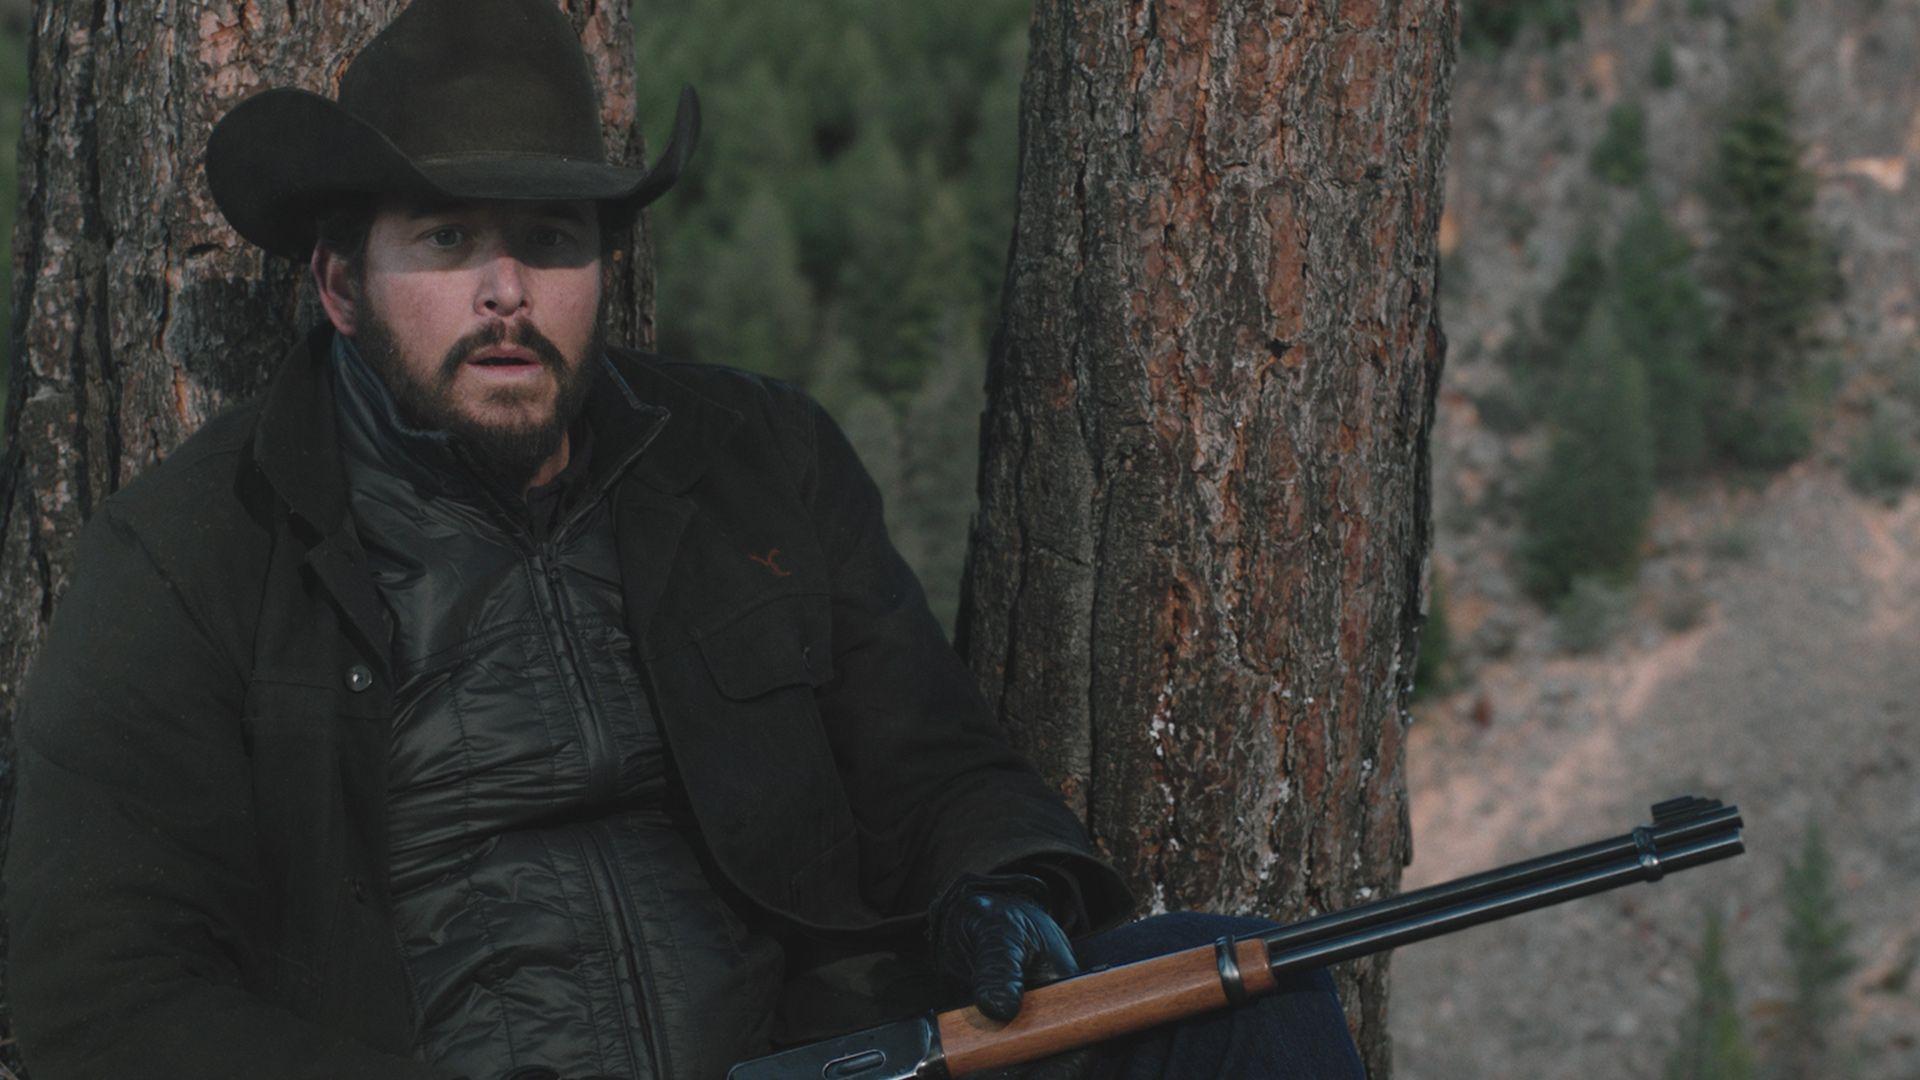 Yellowstone season 3 episode 4 full episode